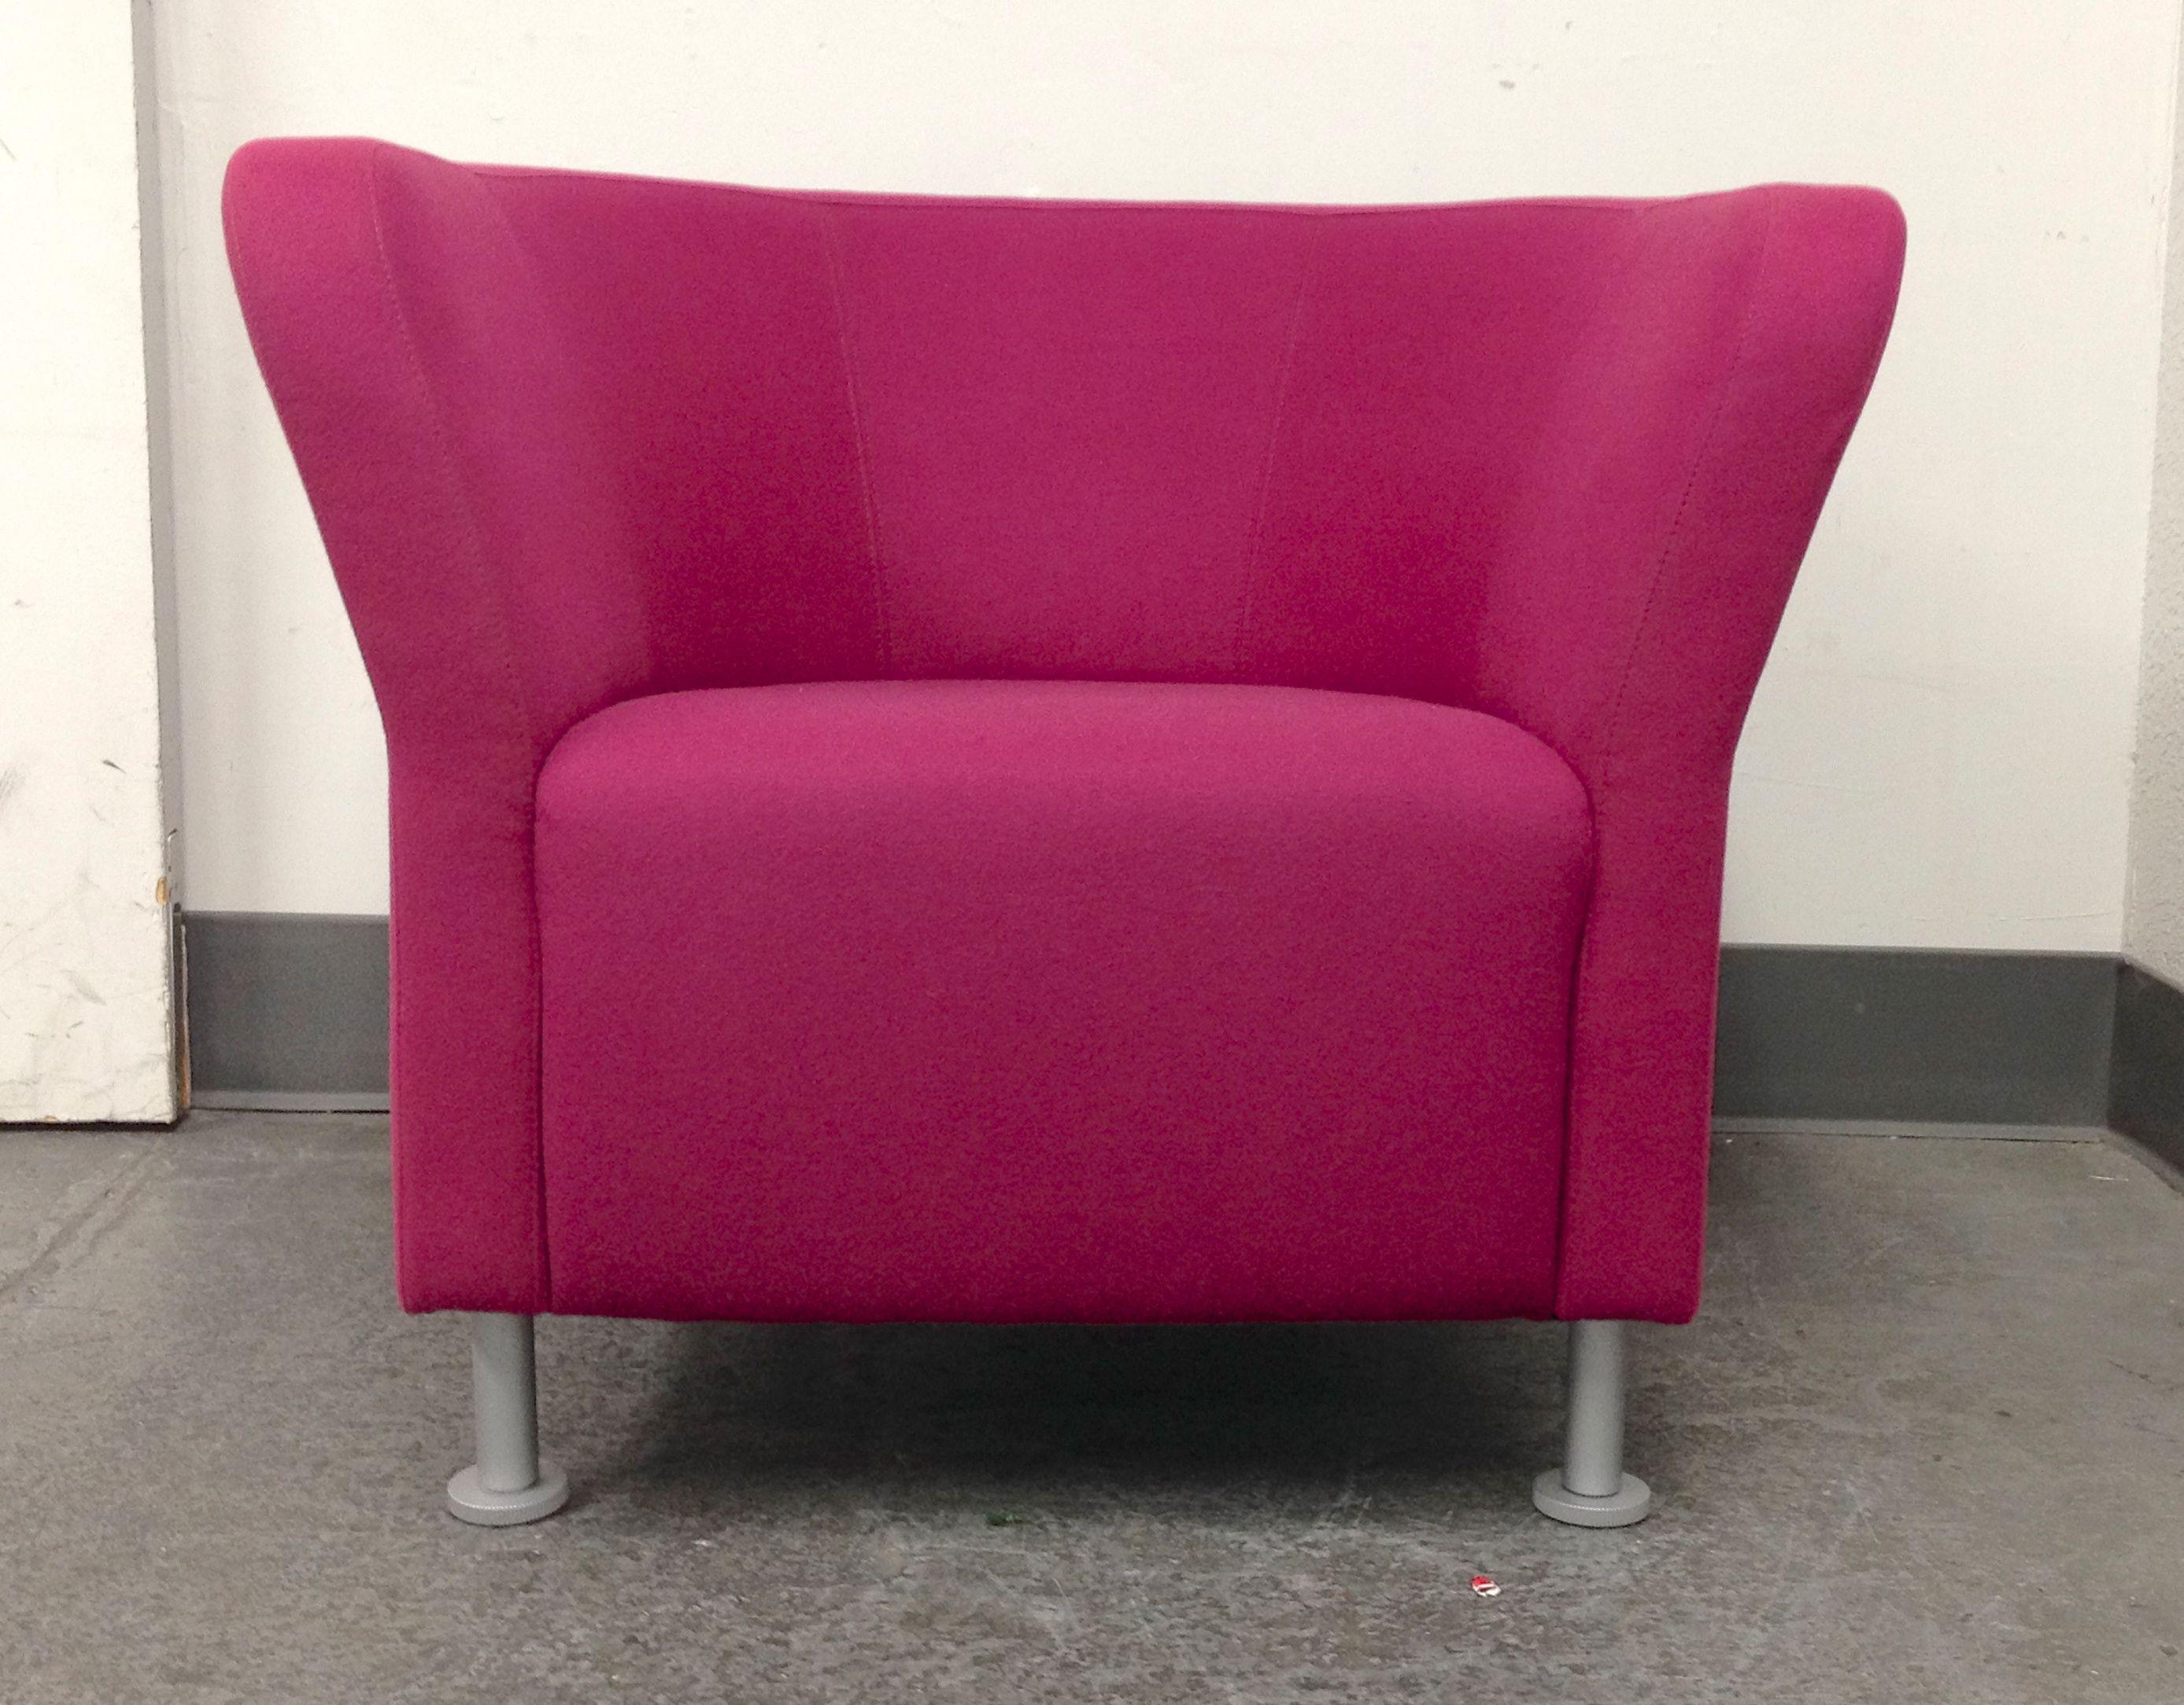 Magenta HON Flock Round Lounge Chairs - A Pair : Chairish